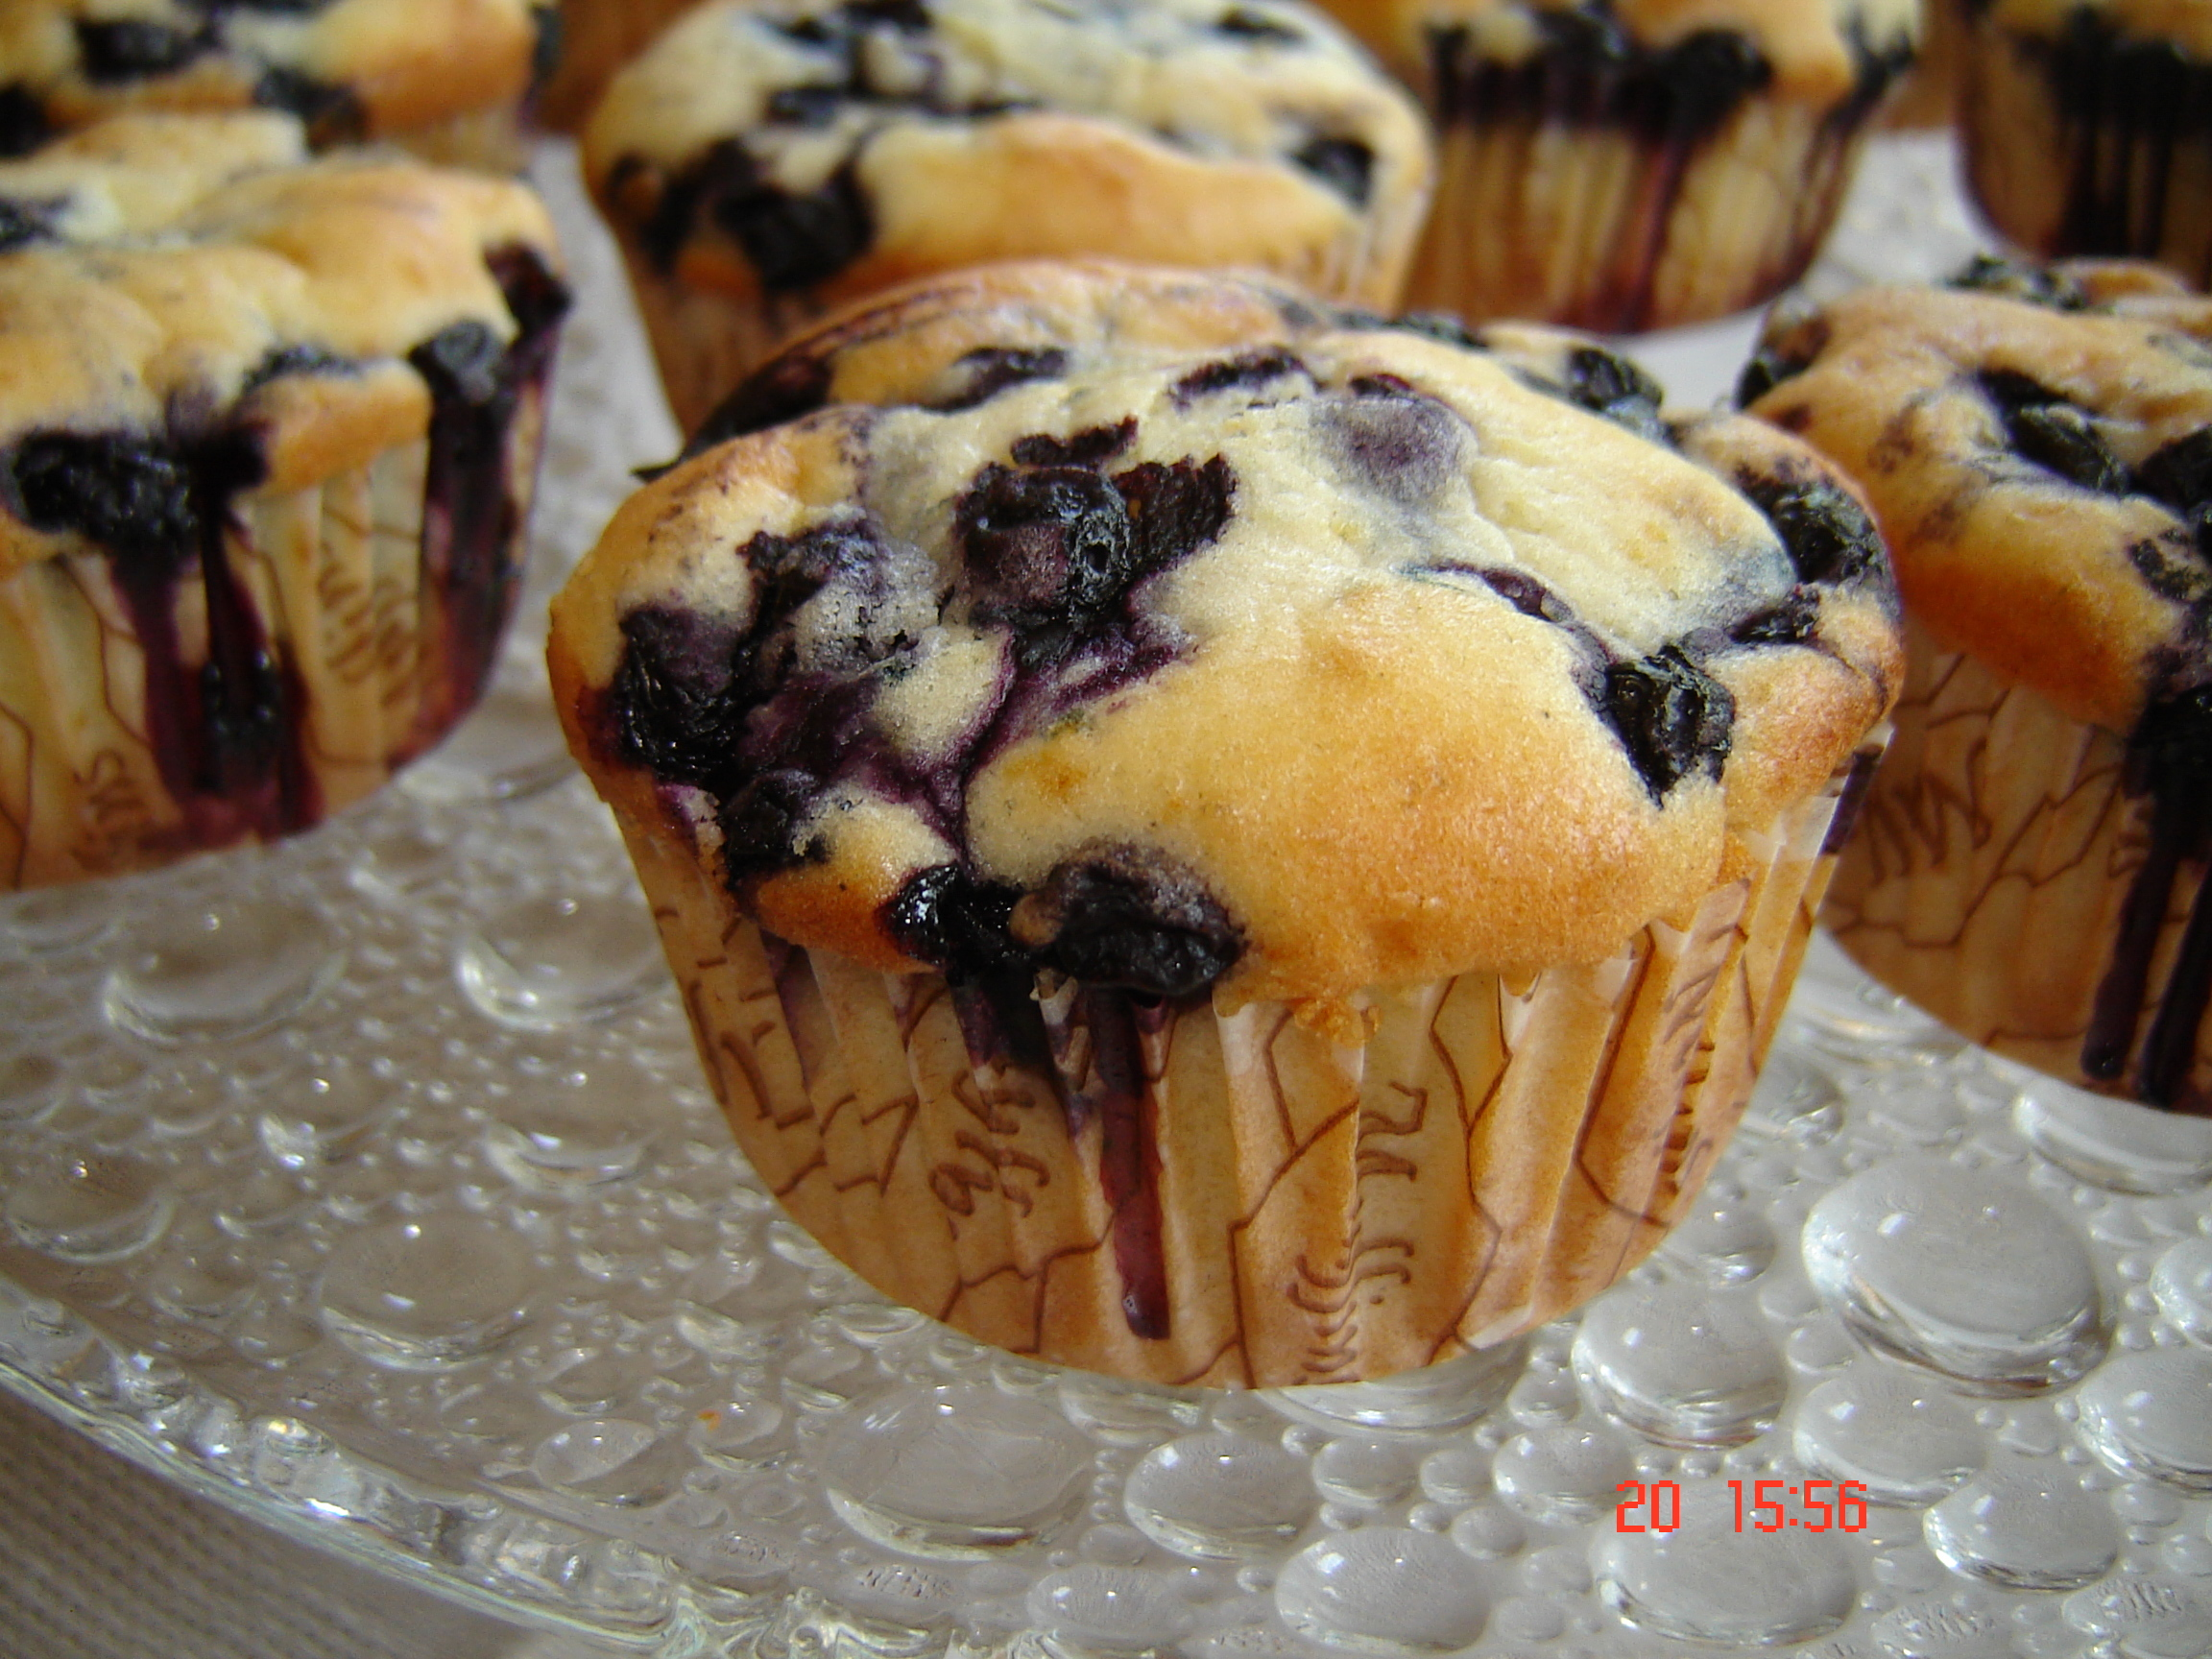 muffin smet vanliga